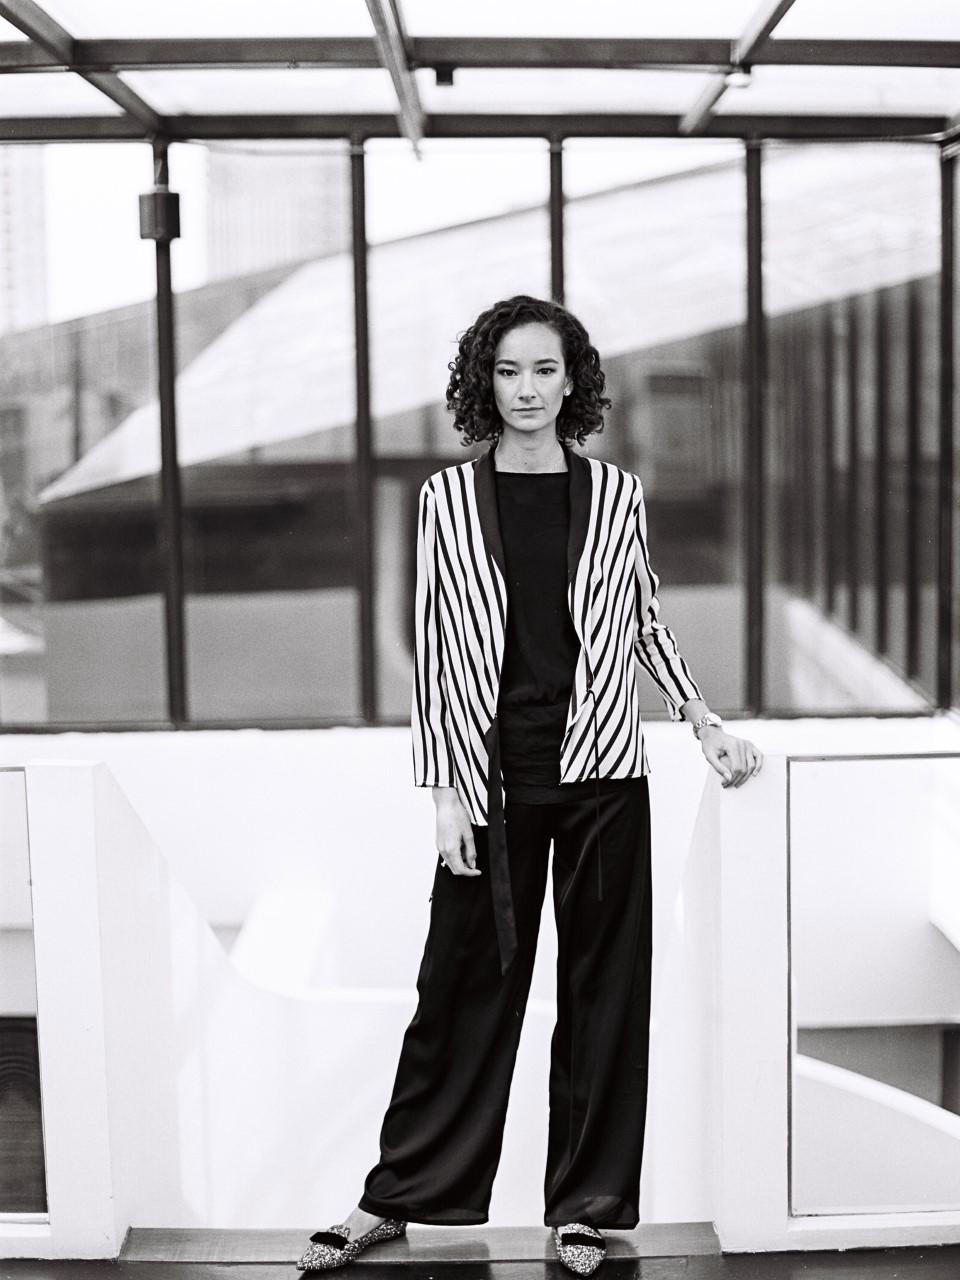 Mercredi 5 Août - Rencontre avec Cyrielle Mohara, fondatrice de Spectrum